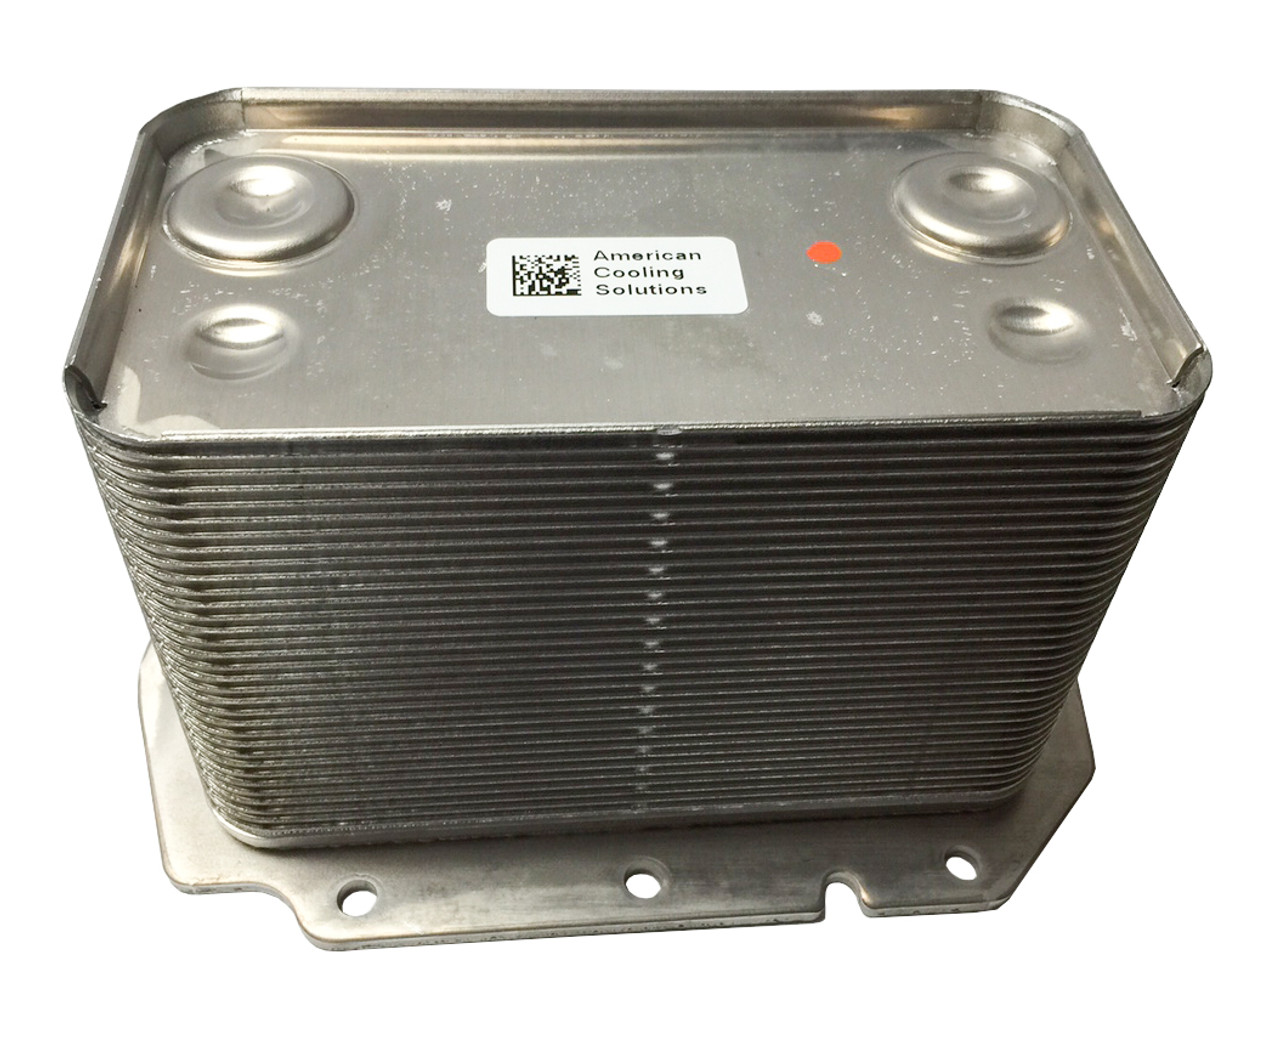 Oil Cooler Kit 1842127c94 For Navistar Dt466e 530 570 Engine 1841779c3 396081500 Made In Usa